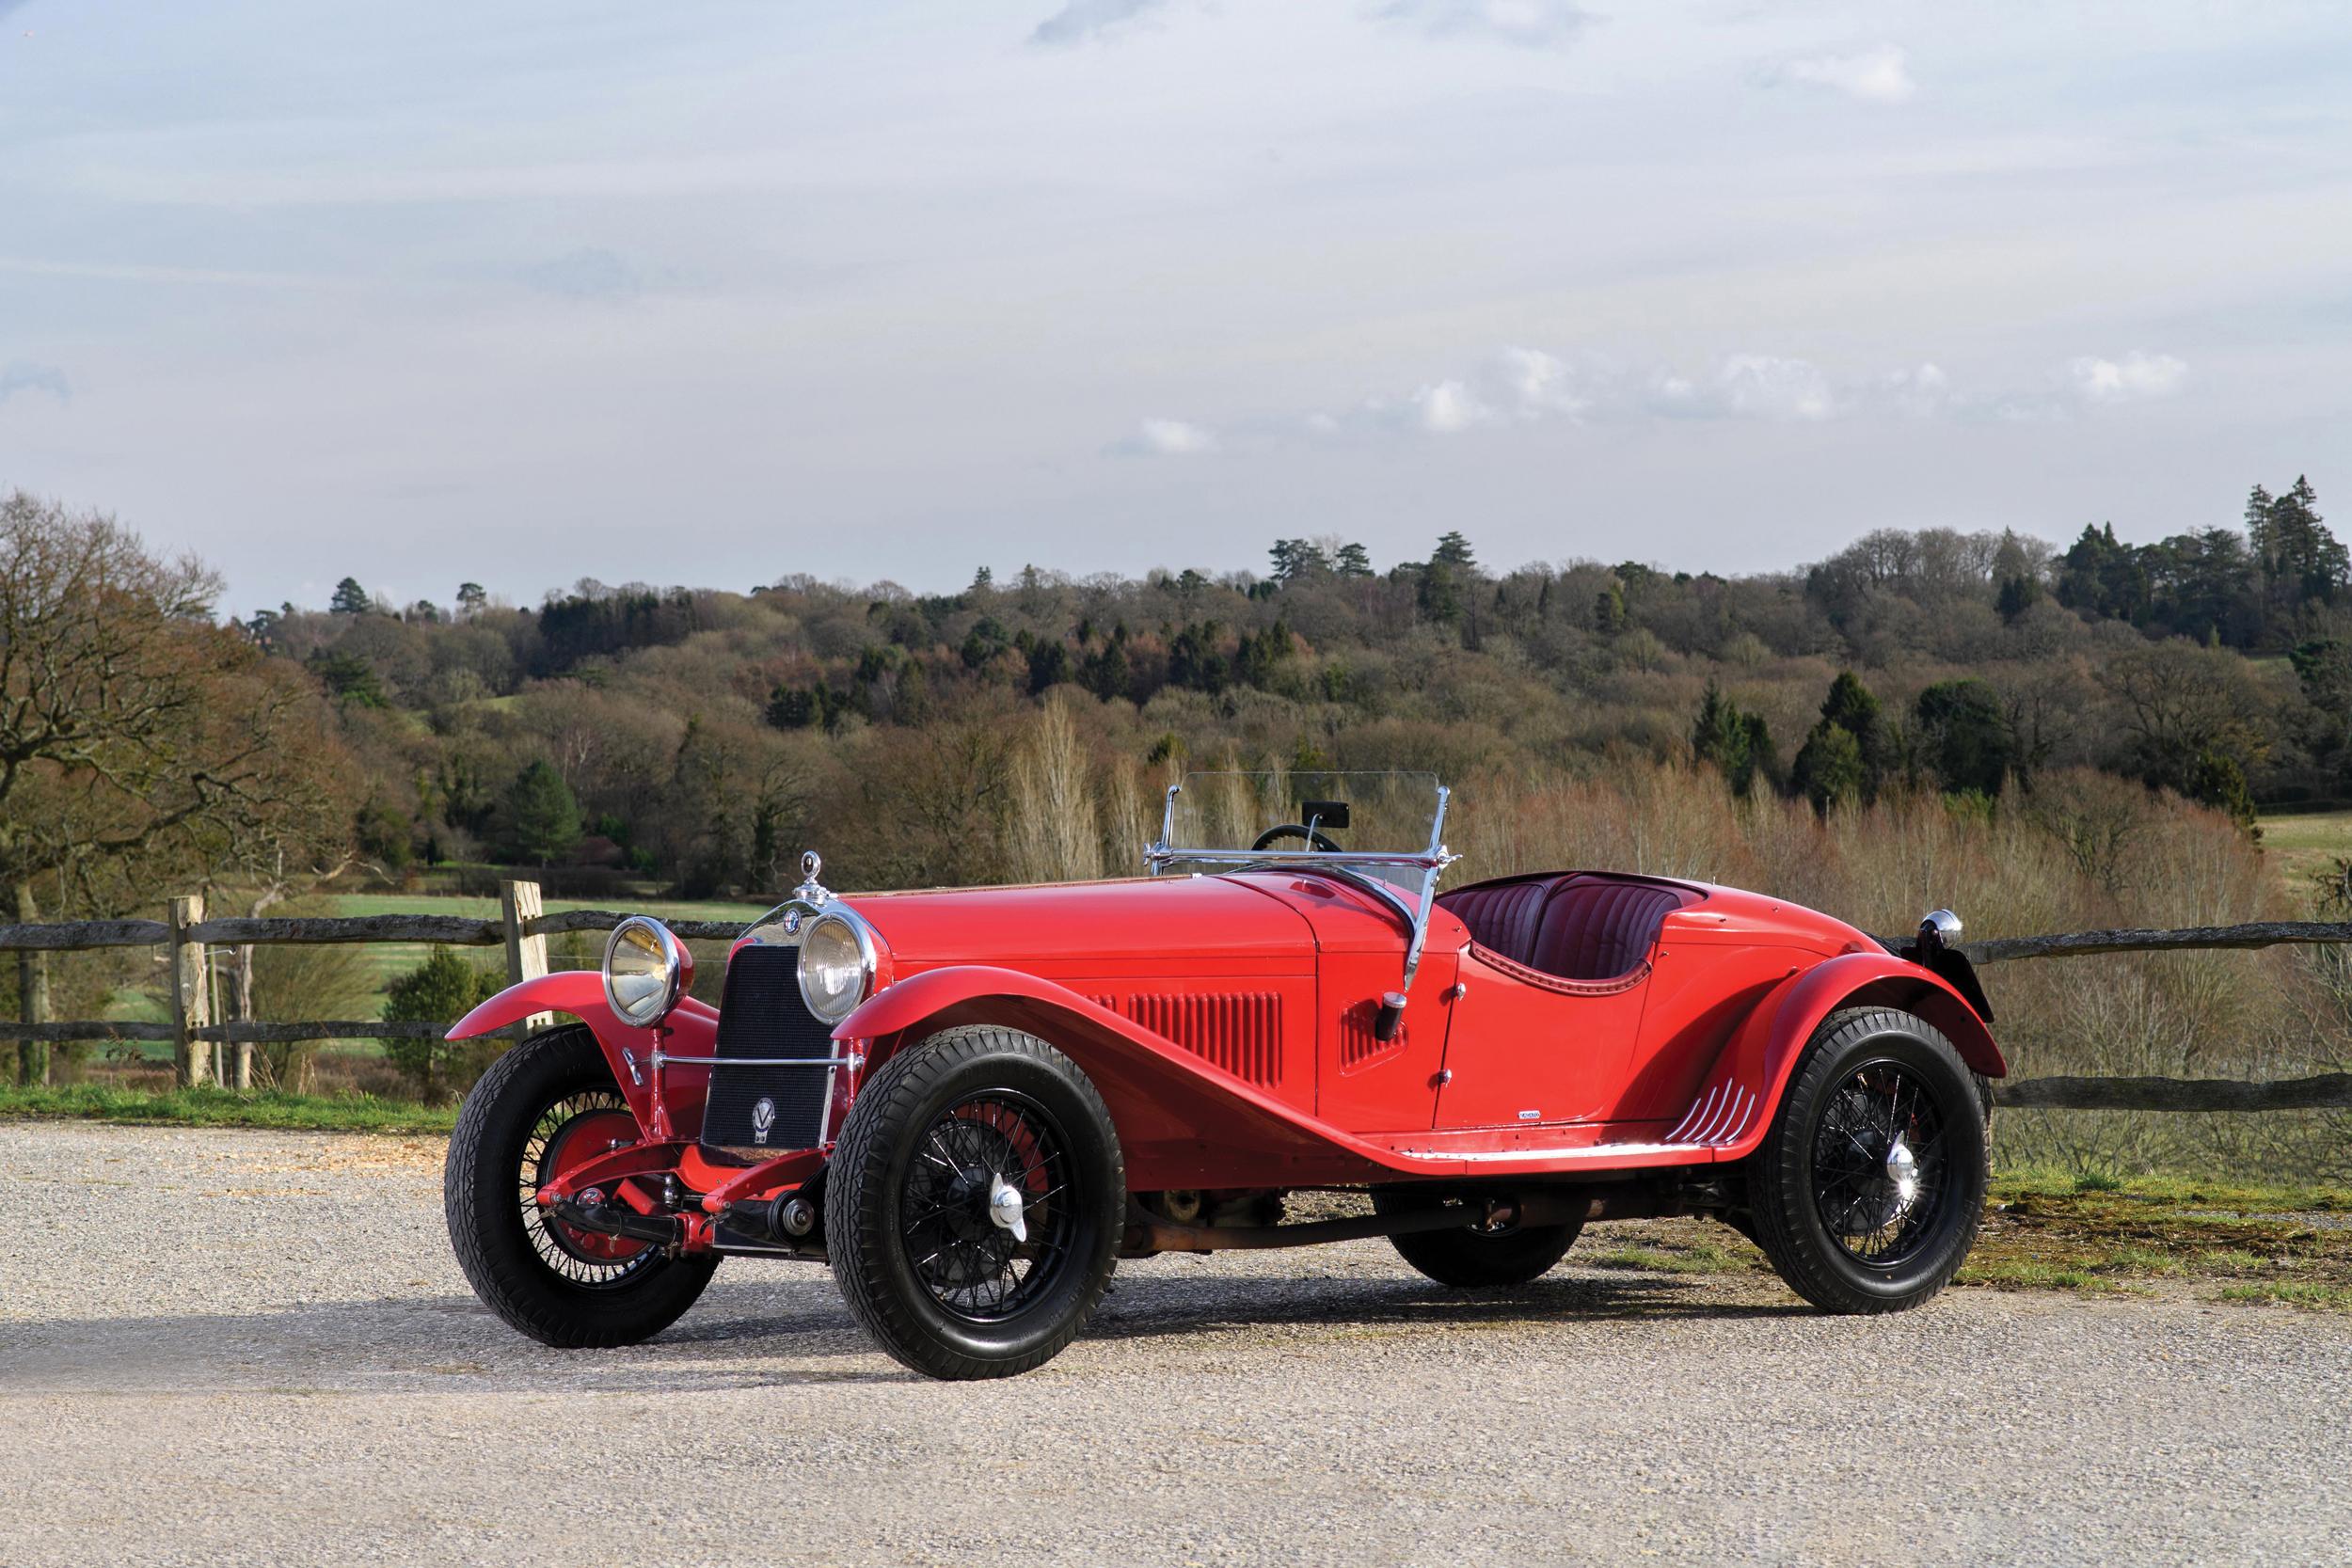 1930 Alfa Romeo 6C 1750 Gran Turismo Series IV Spider Tim Scott ©2020 Courtesy of RM Sotheby's